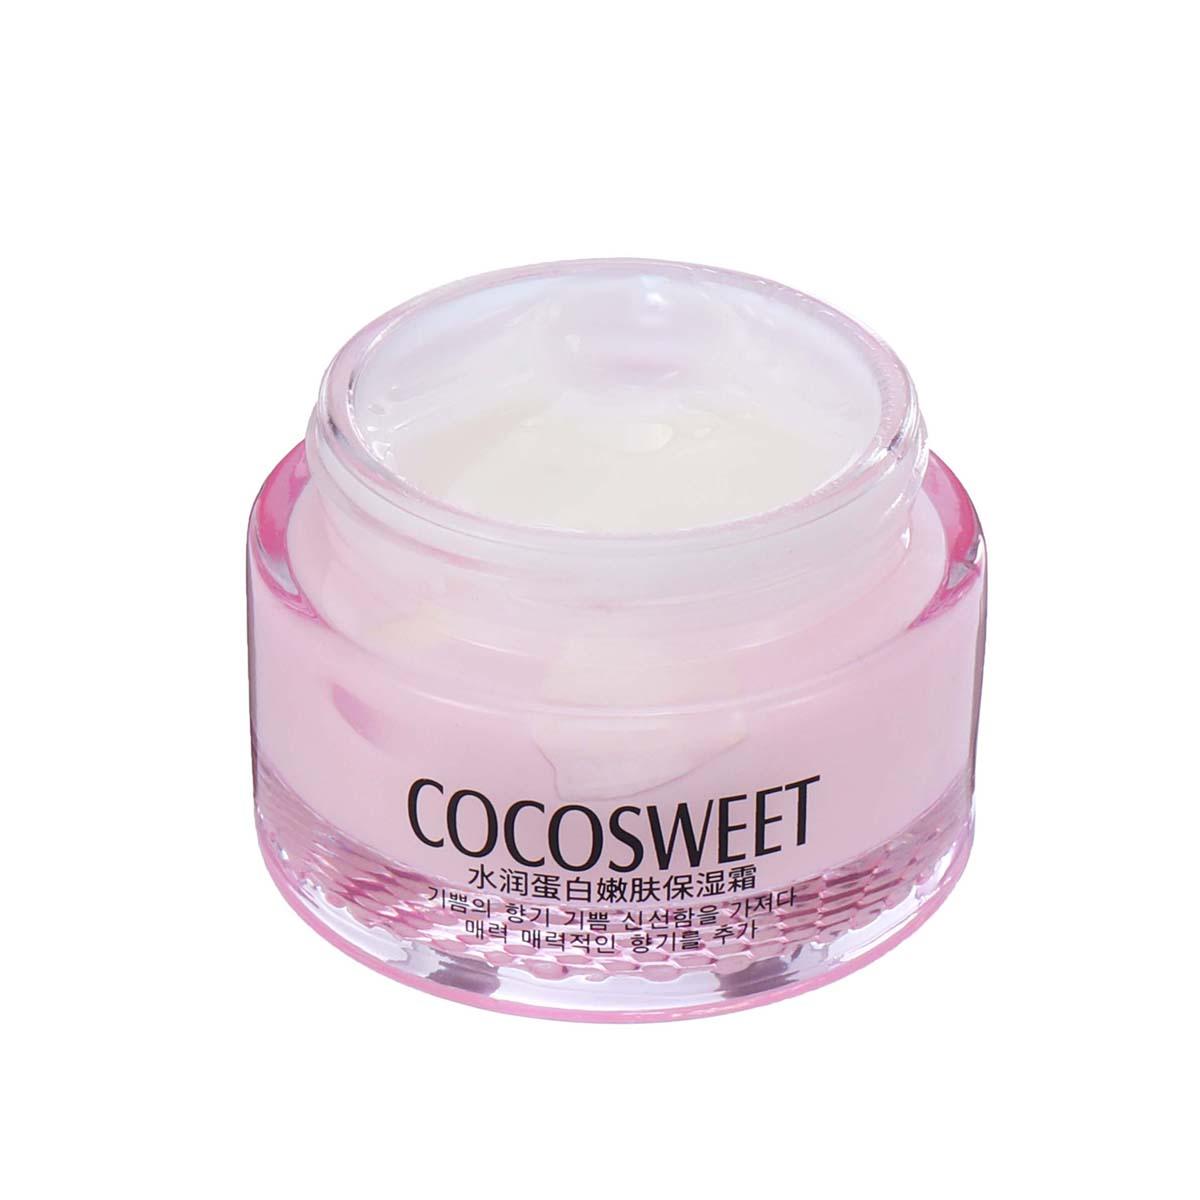 Cream Whitening Fresh Face